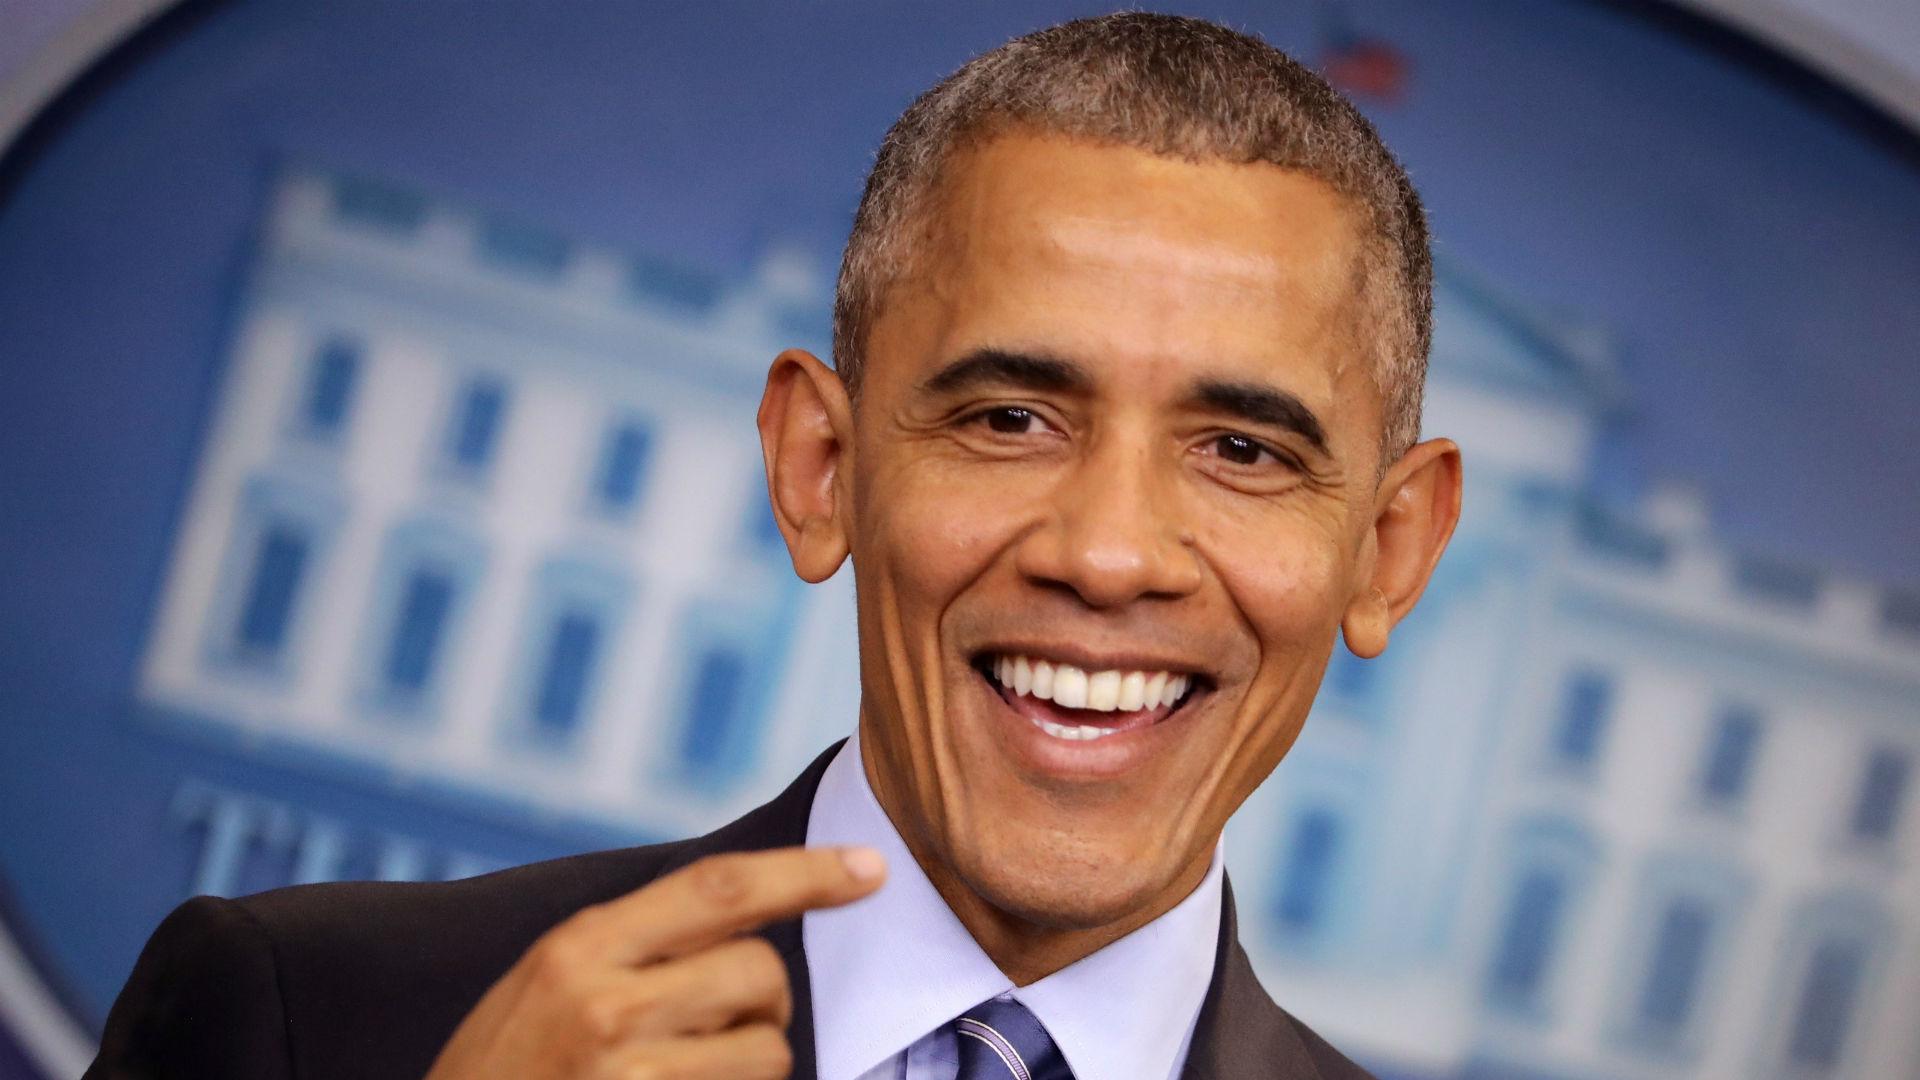 Barack-obama-ftr-gettyjpg_17uucbtfg2vnv1h2qy75teaslz